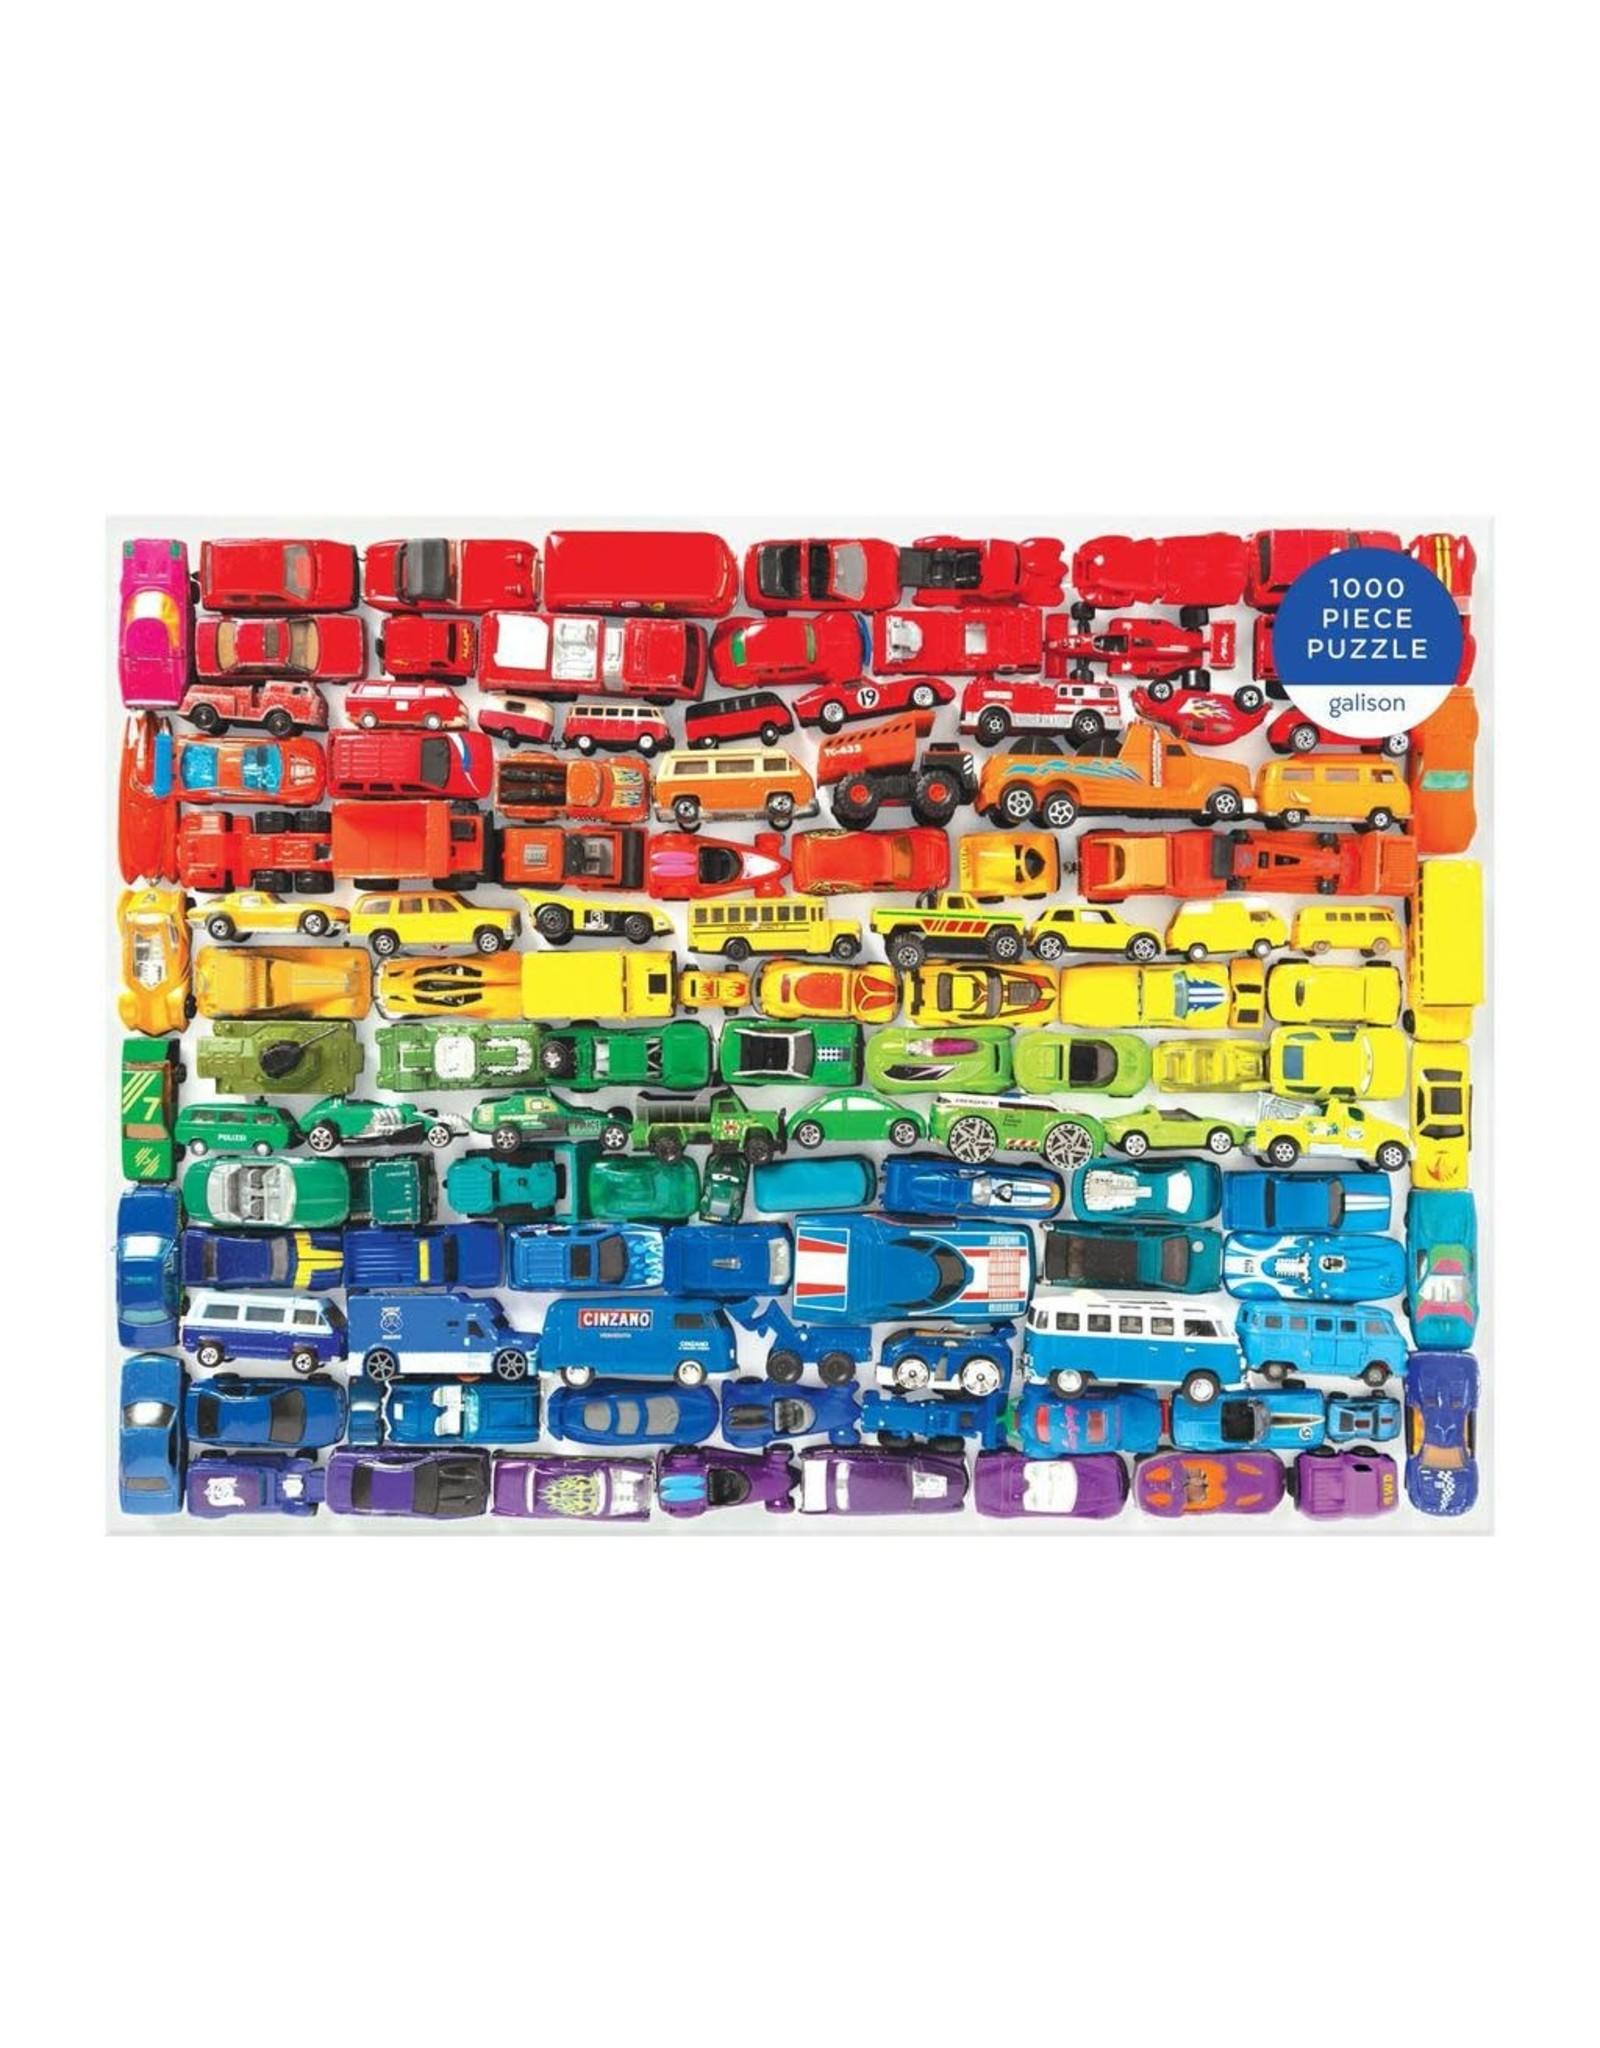 Galison Rainbow Toy Cars 1000 Pc Puzzle